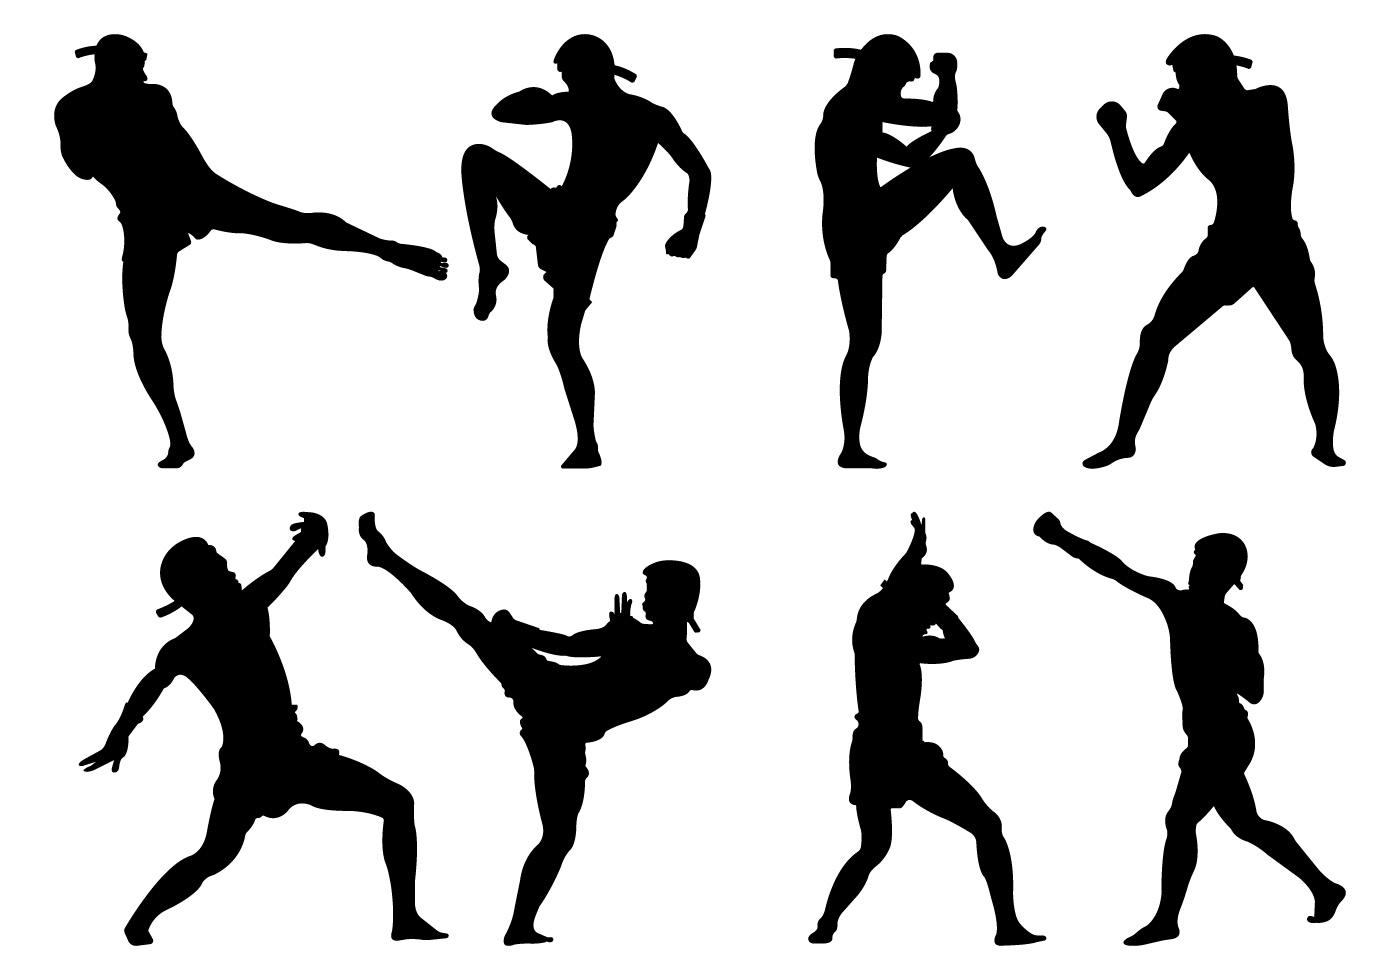 Colecao Silhouette Muay Thai Pose Vector Download Vetores Gratis